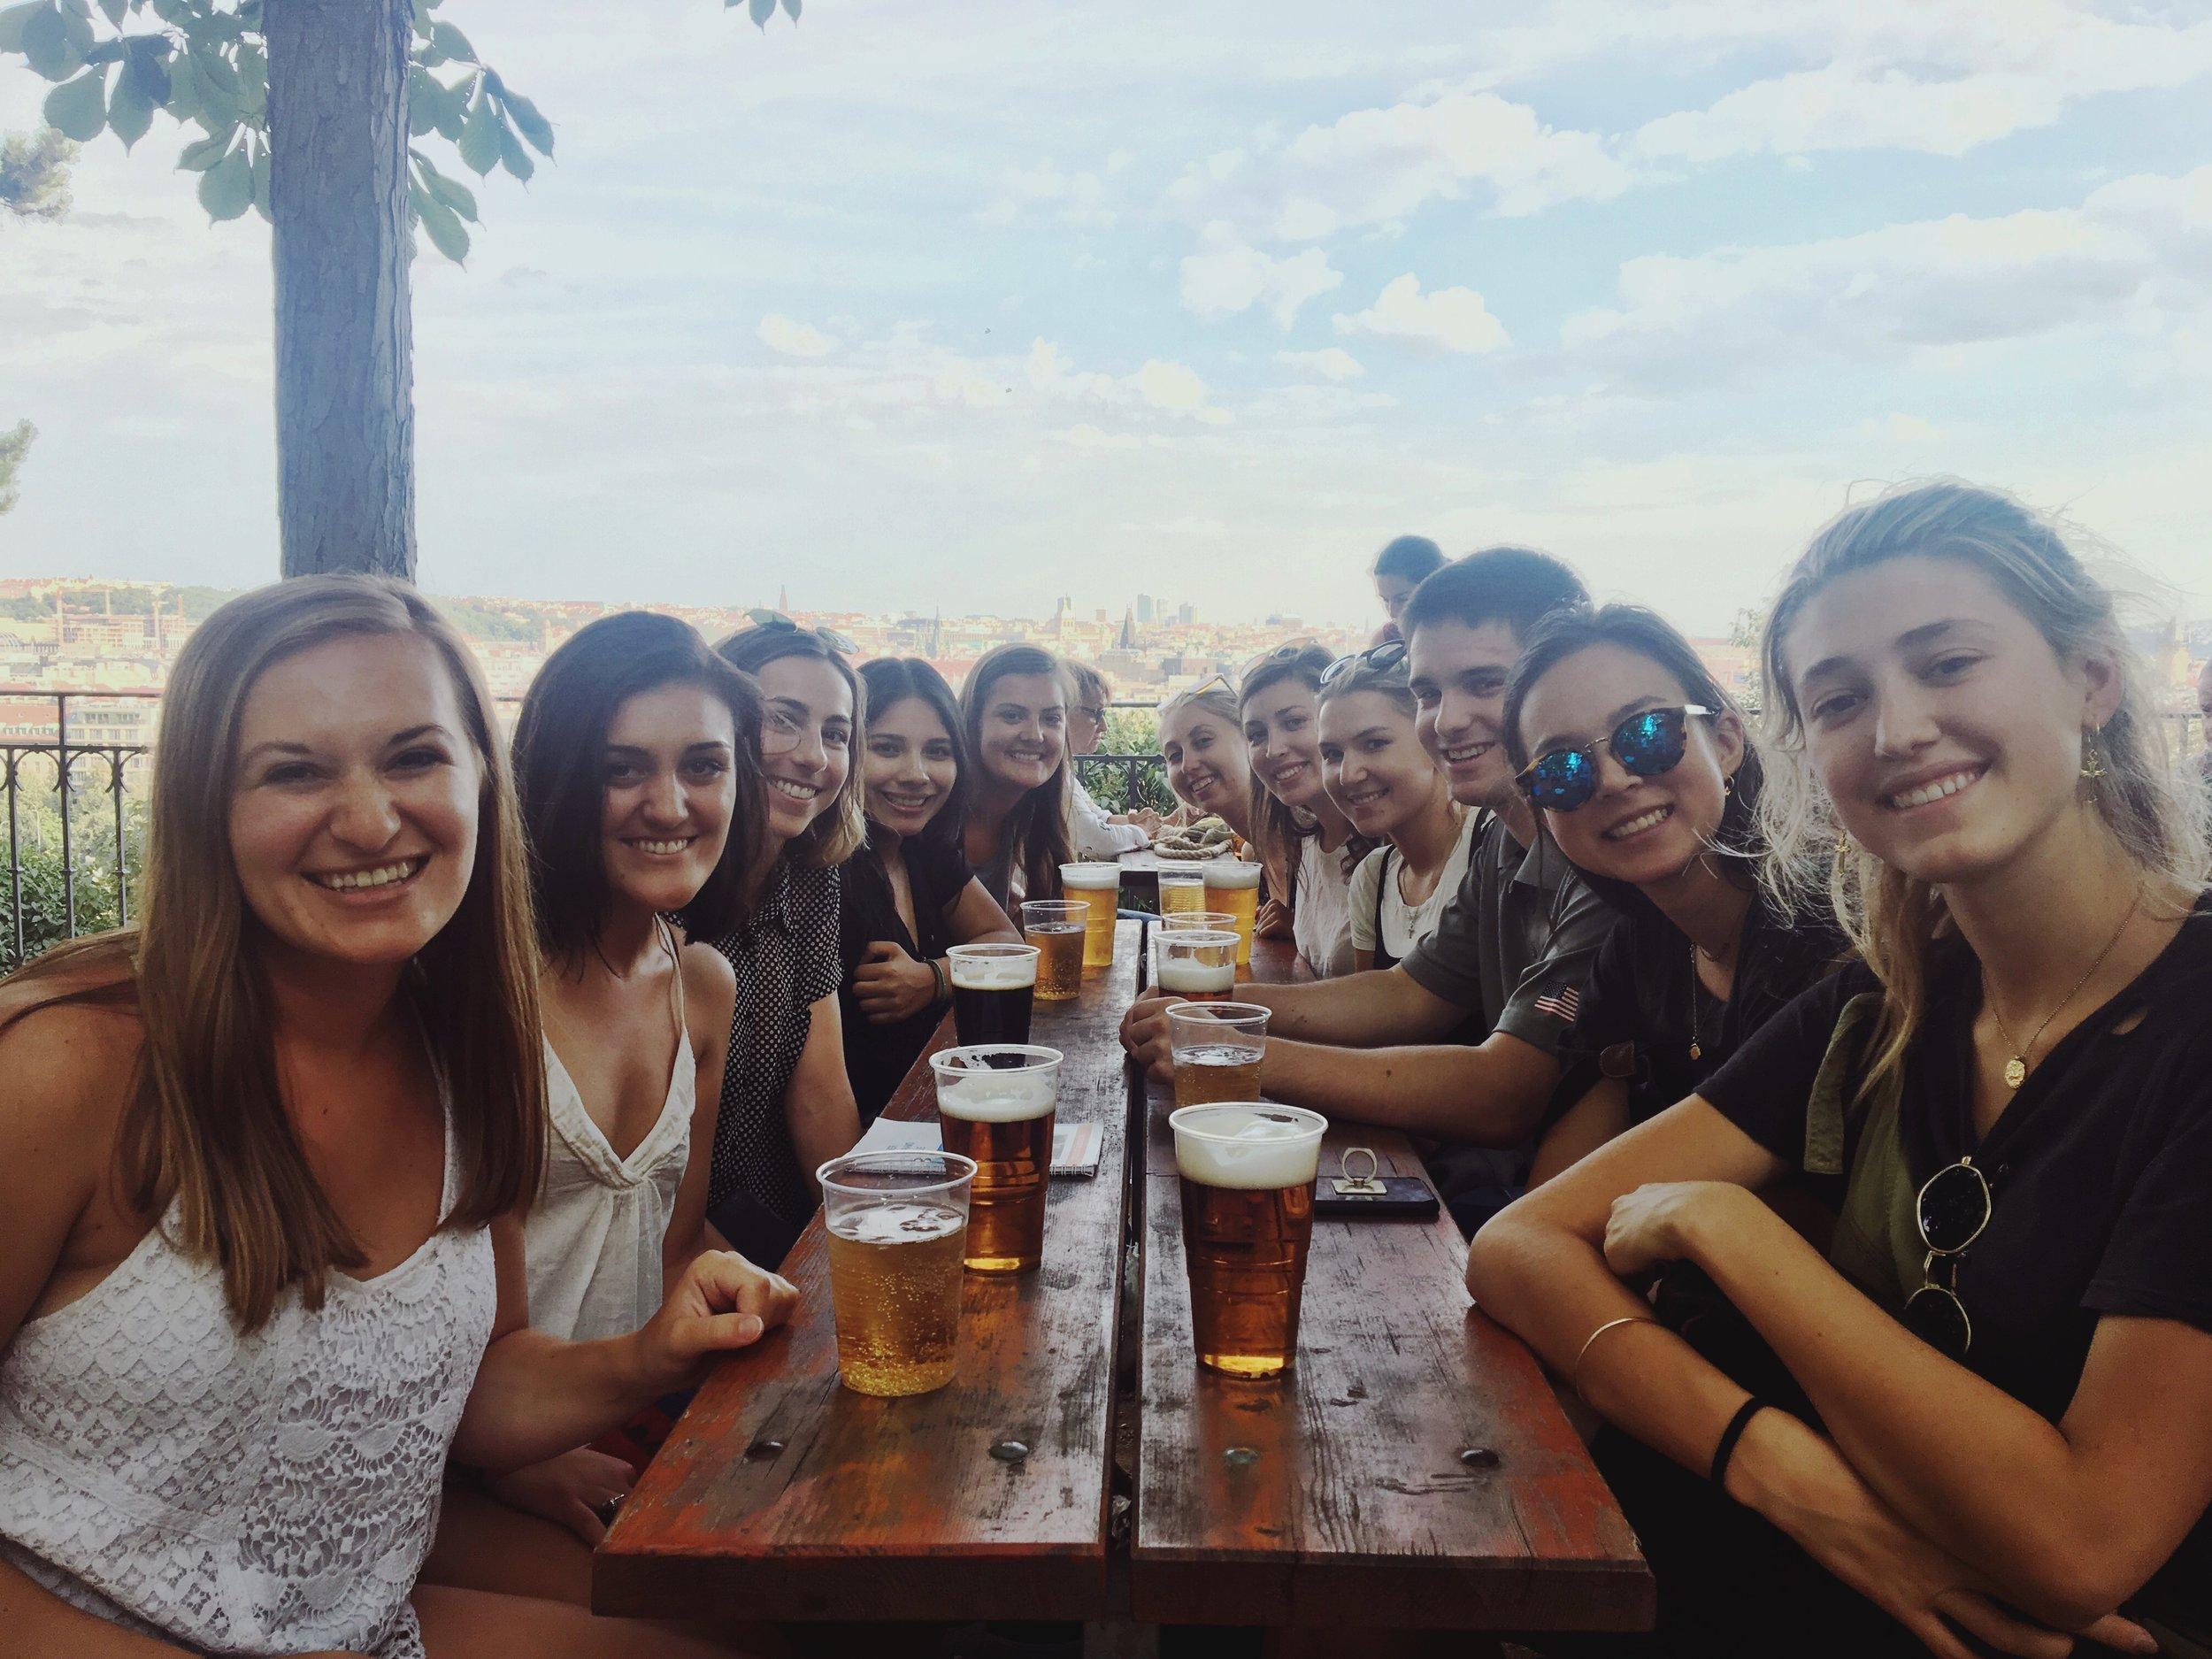 Post-orientation beer garden hangs | Riegrovy Sady